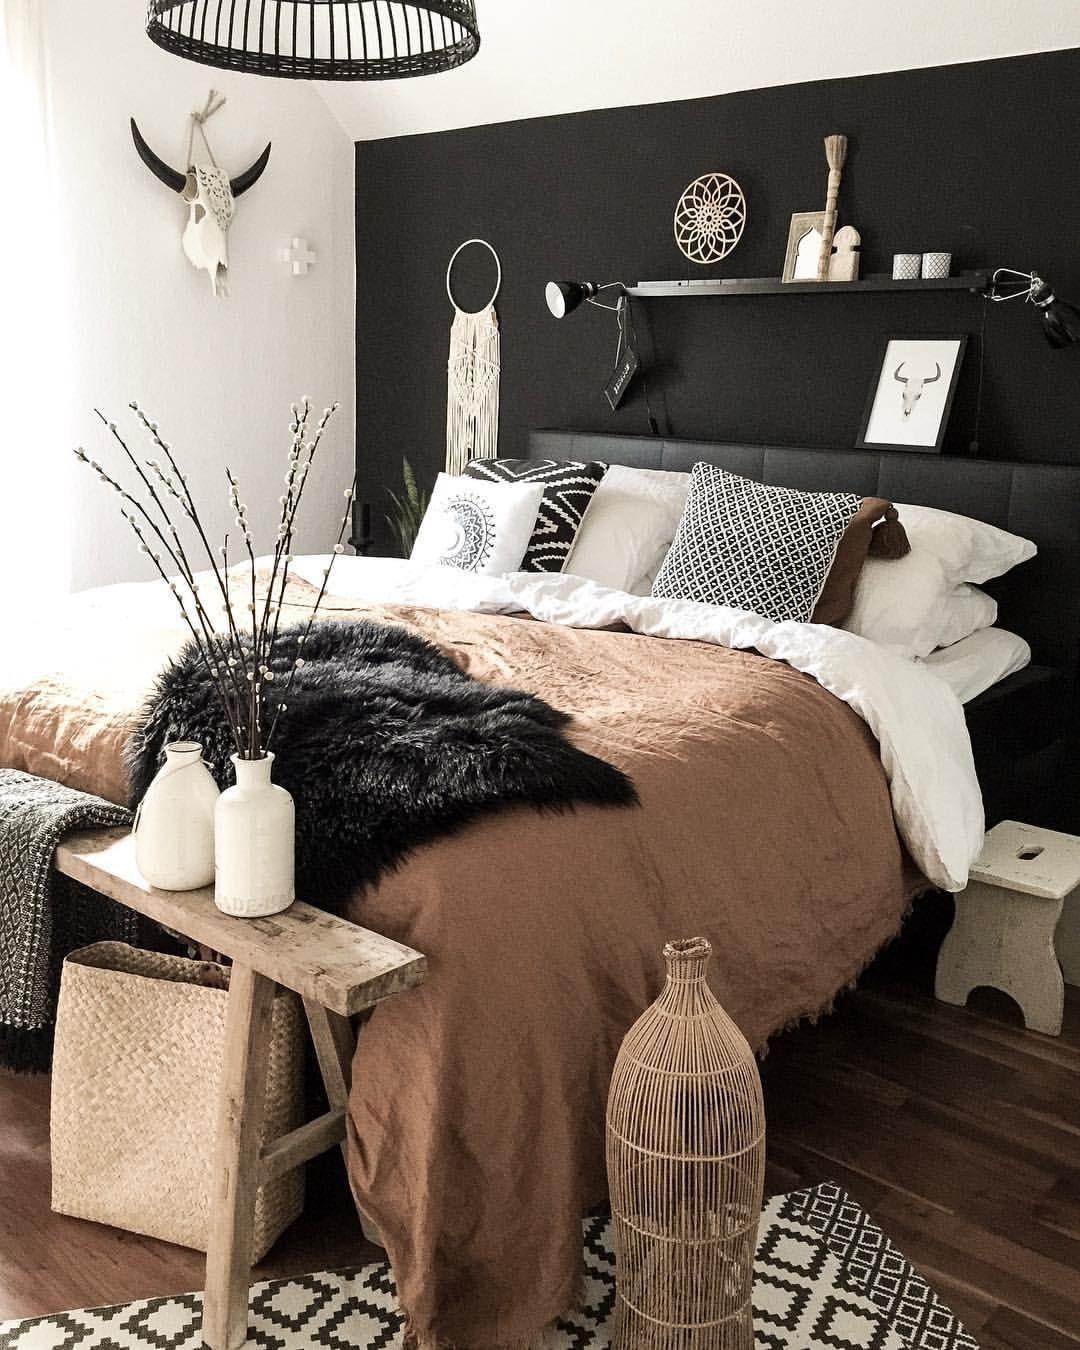 Pinterest Maebelbelle Home Bedroom Home Decor Bedroom Bedroom Makeover